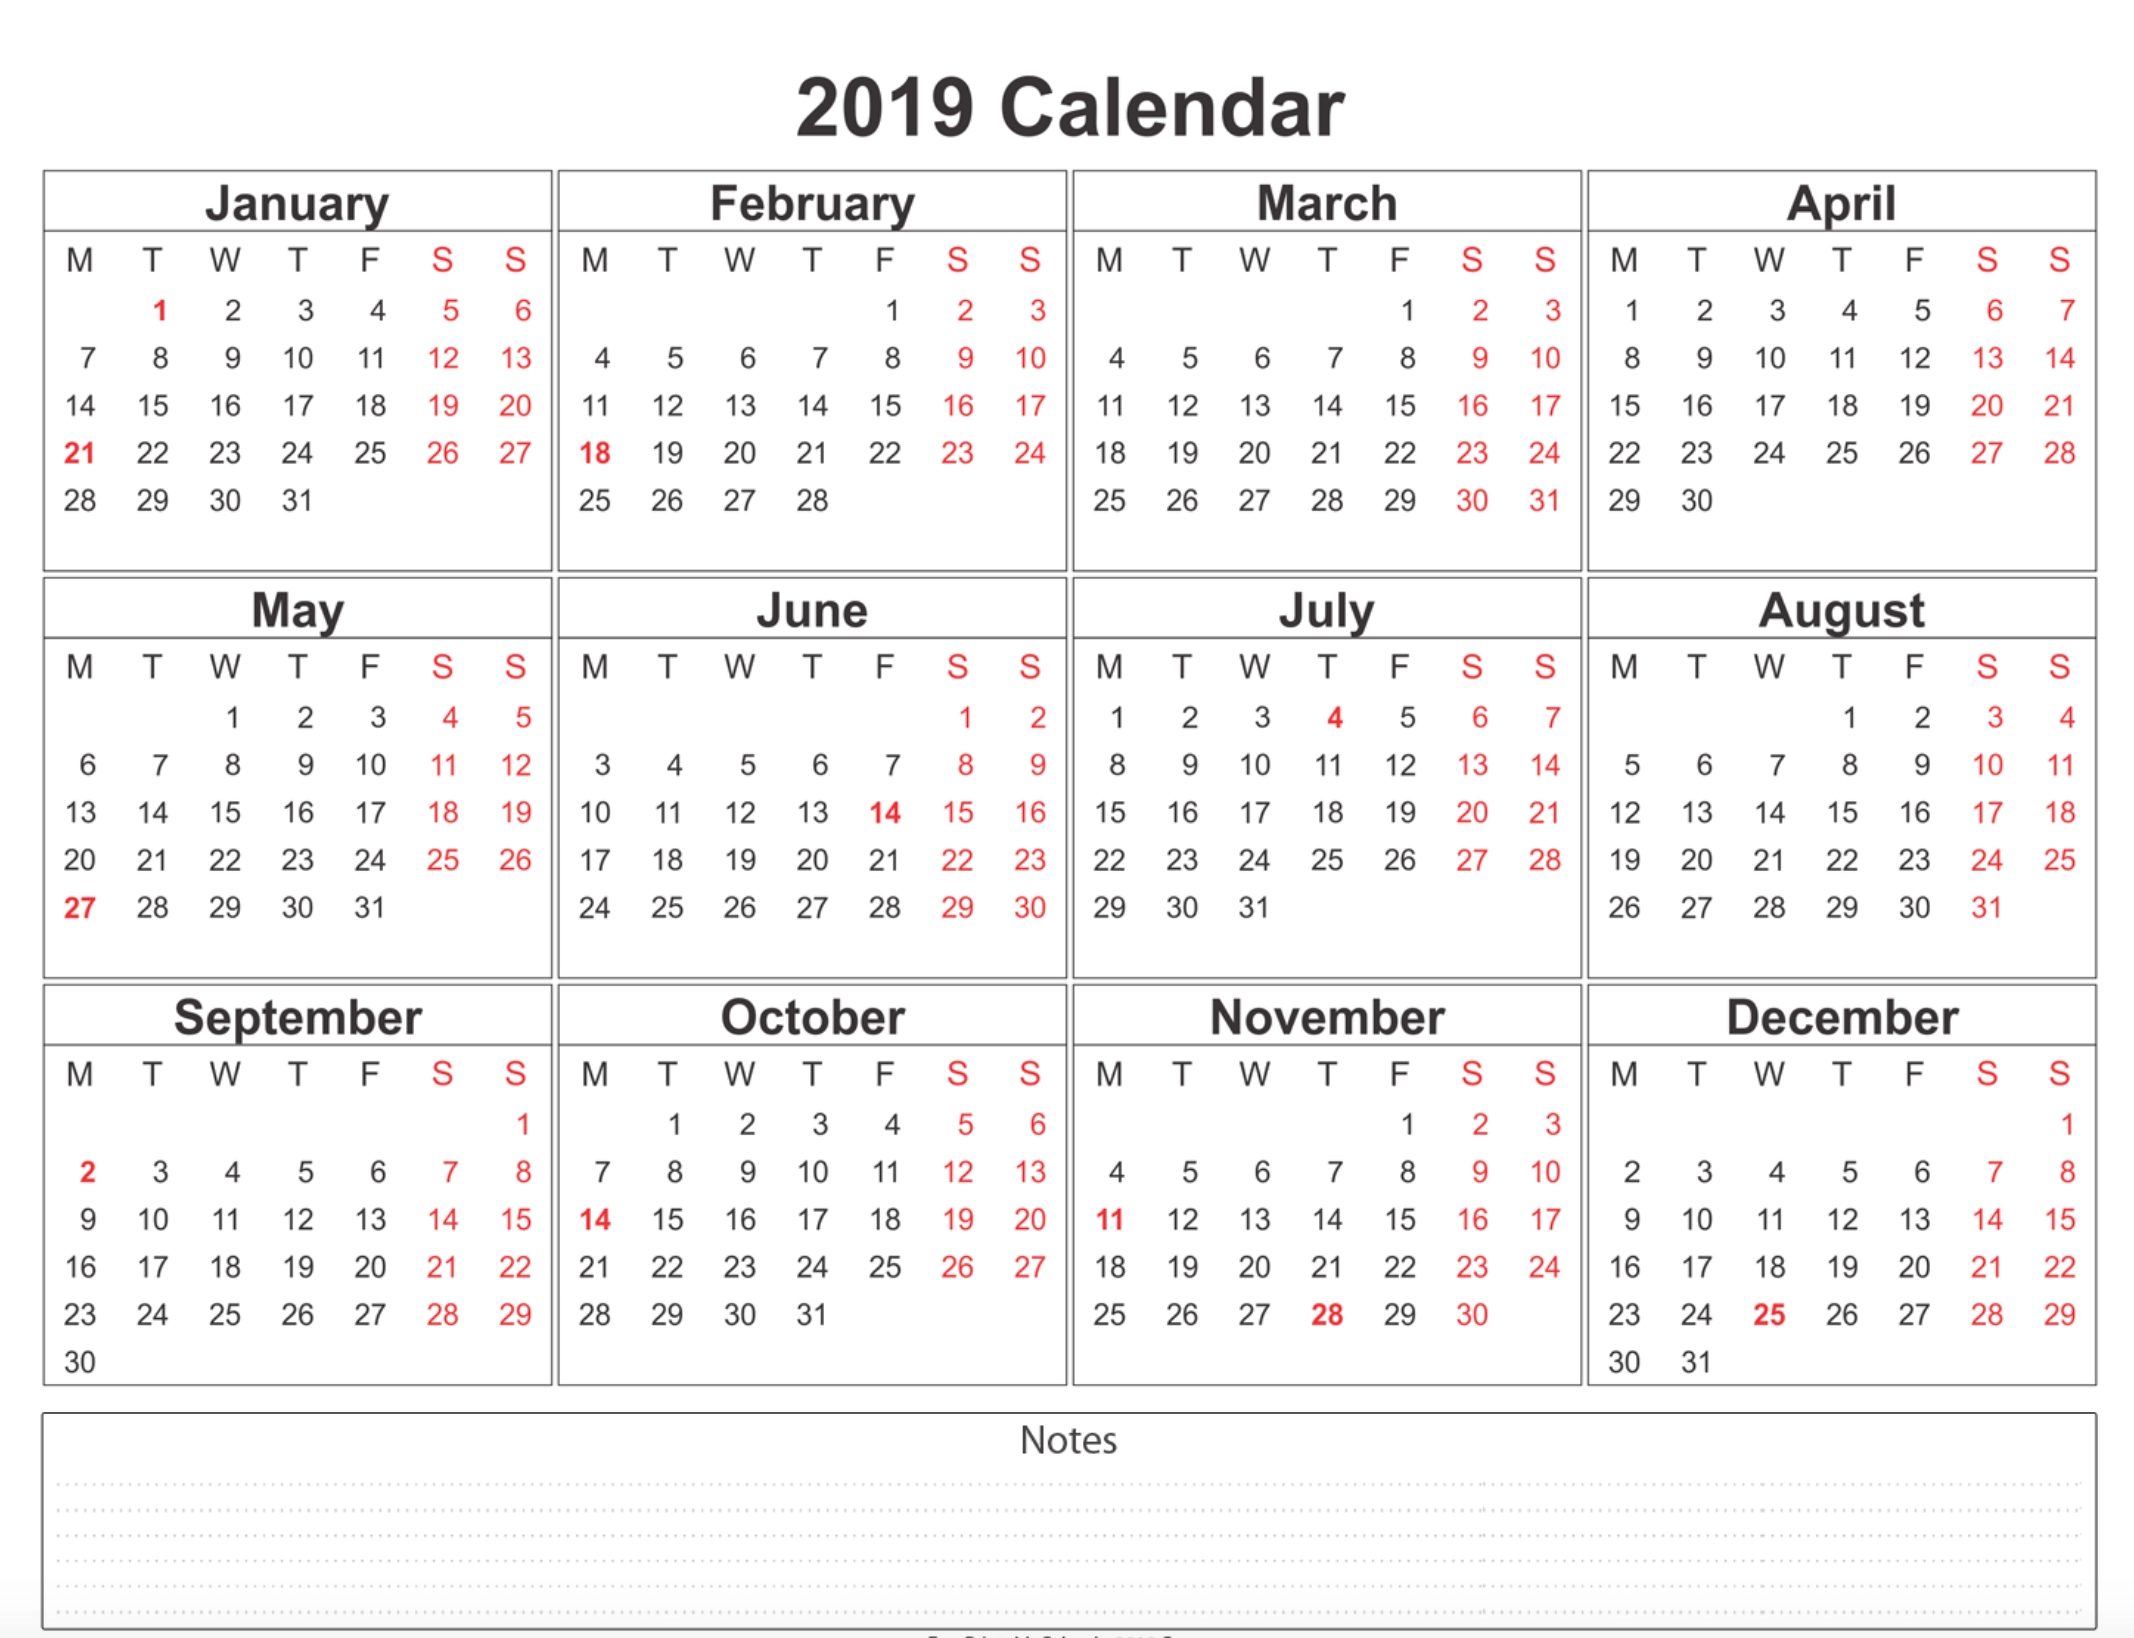 Free Printable Calendar 2019 With Holidays Blank 12 Month Calendar